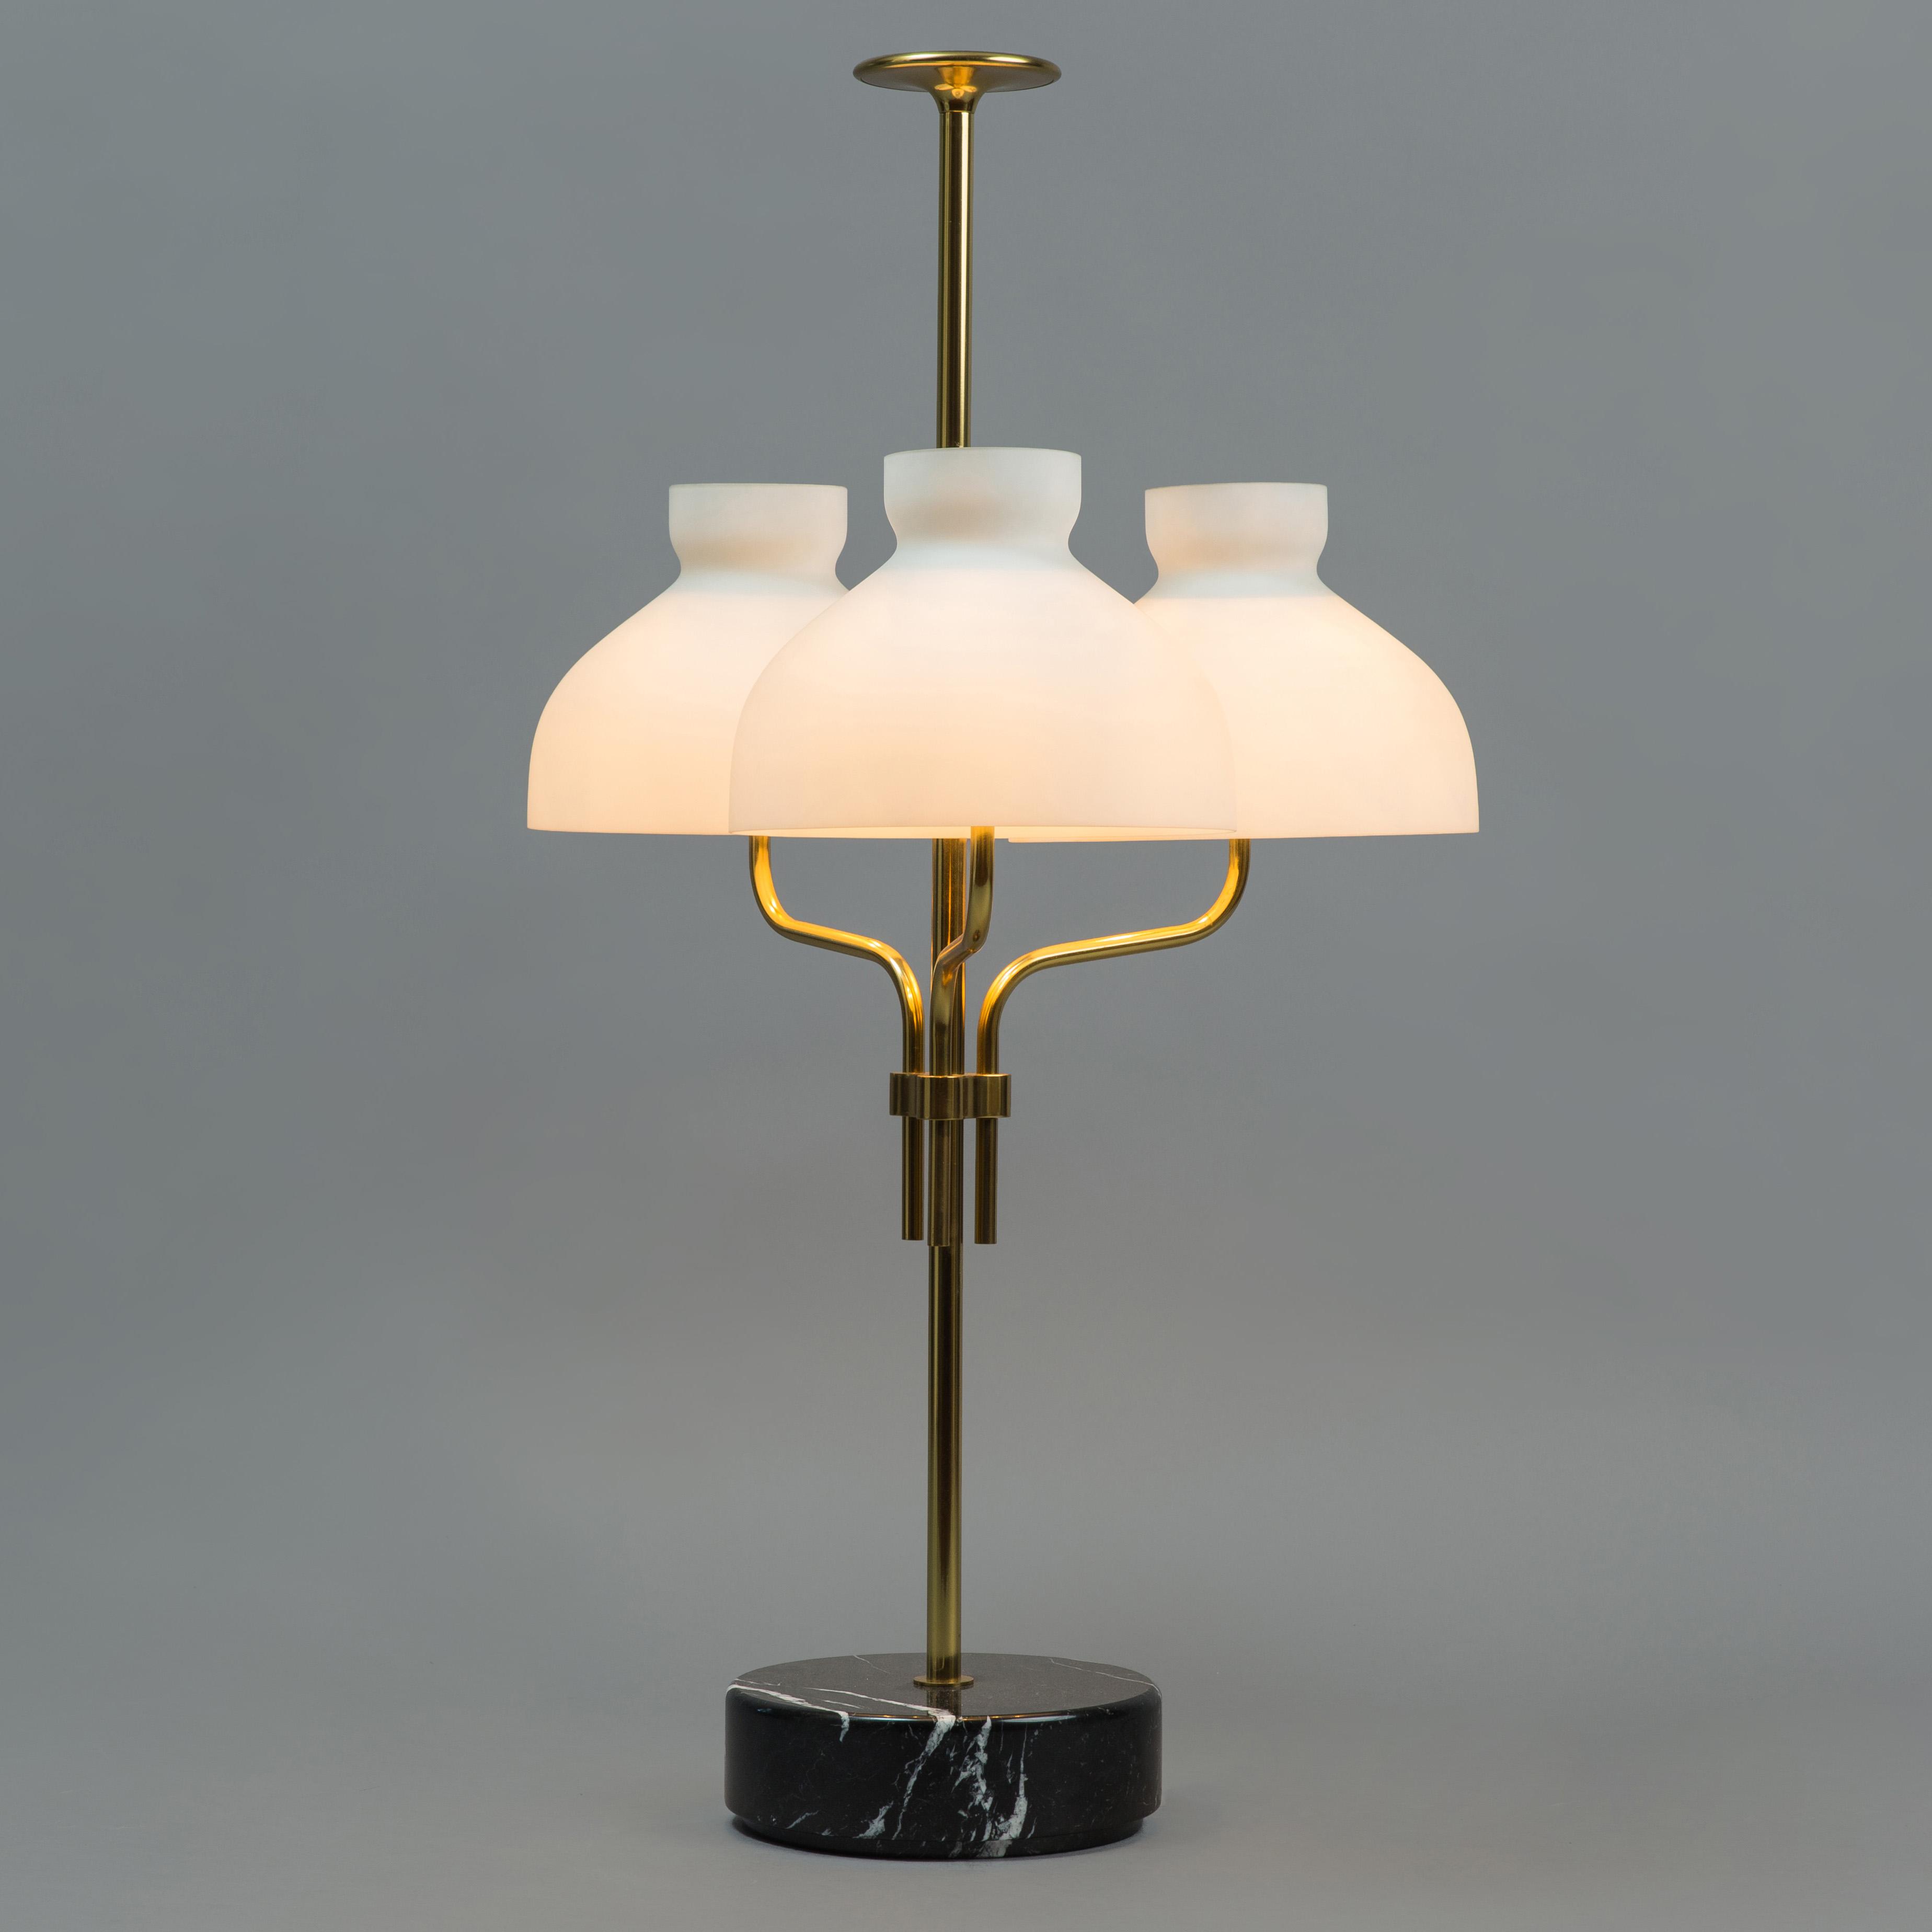 'Arenzano tre fiamme' Large Table Lamp by Ignazio Gardella for Azucena | soyun k.